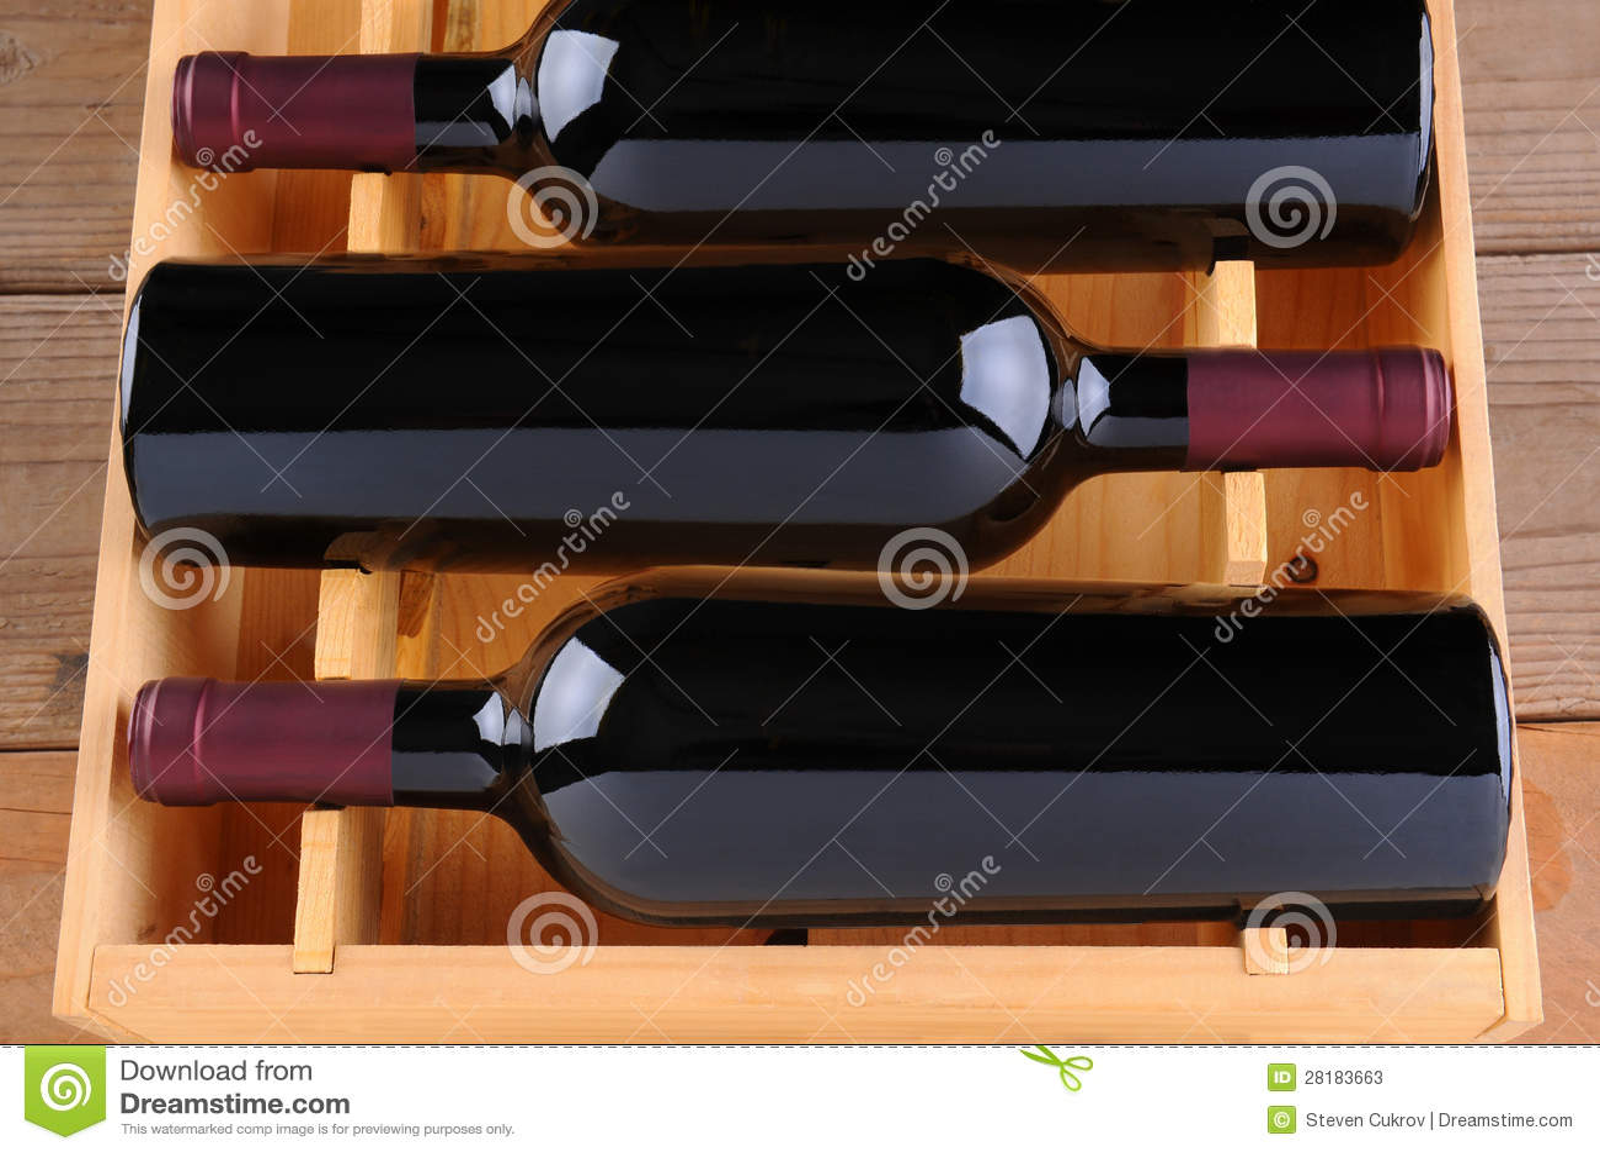 Three Red Wine Bottles in Wood Case